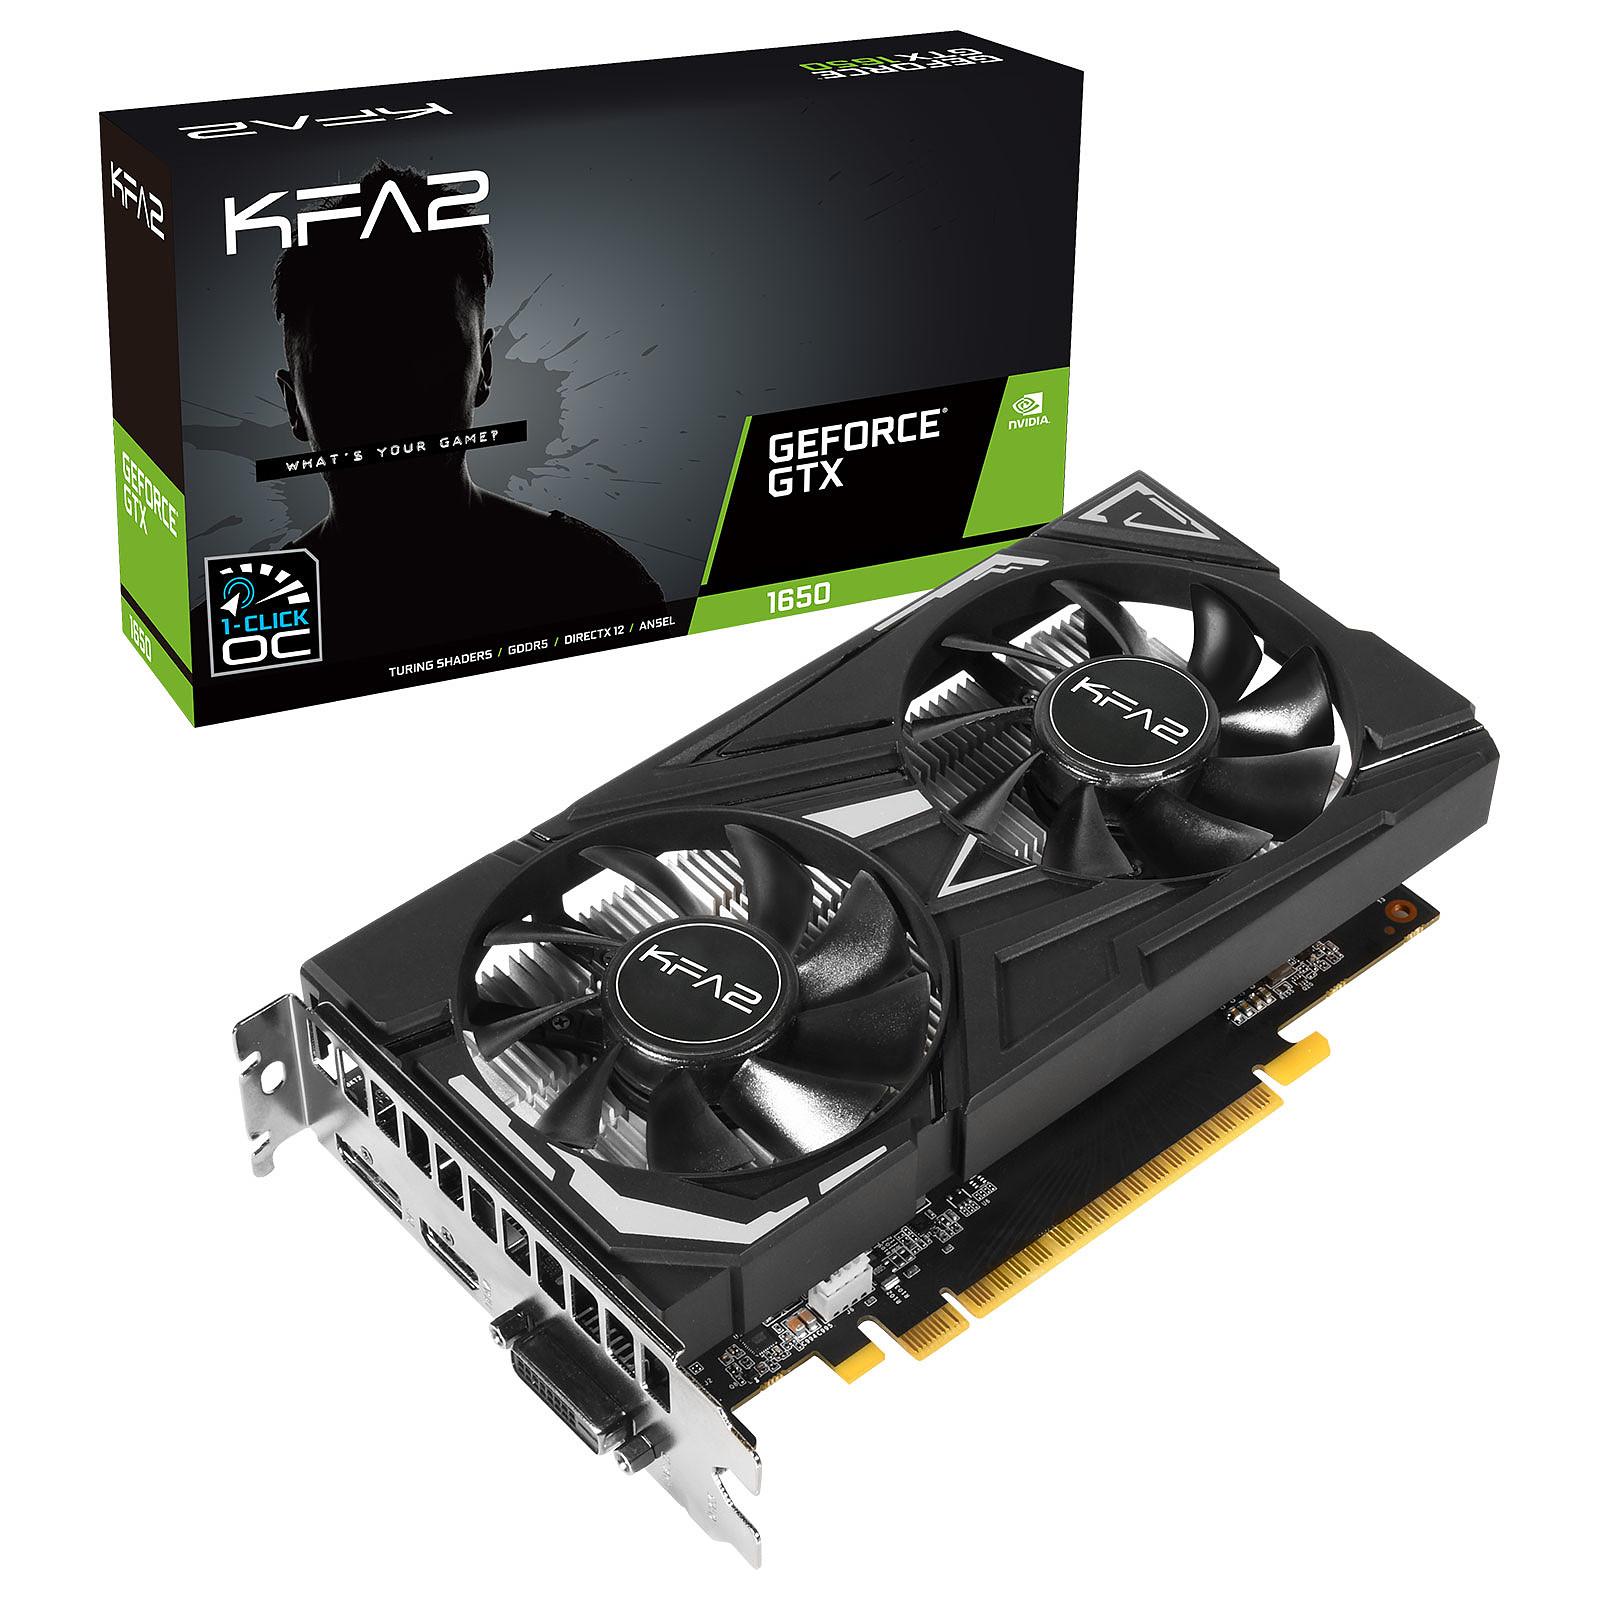 KFA2 GeForce GTX 1650 (1-Click OC)